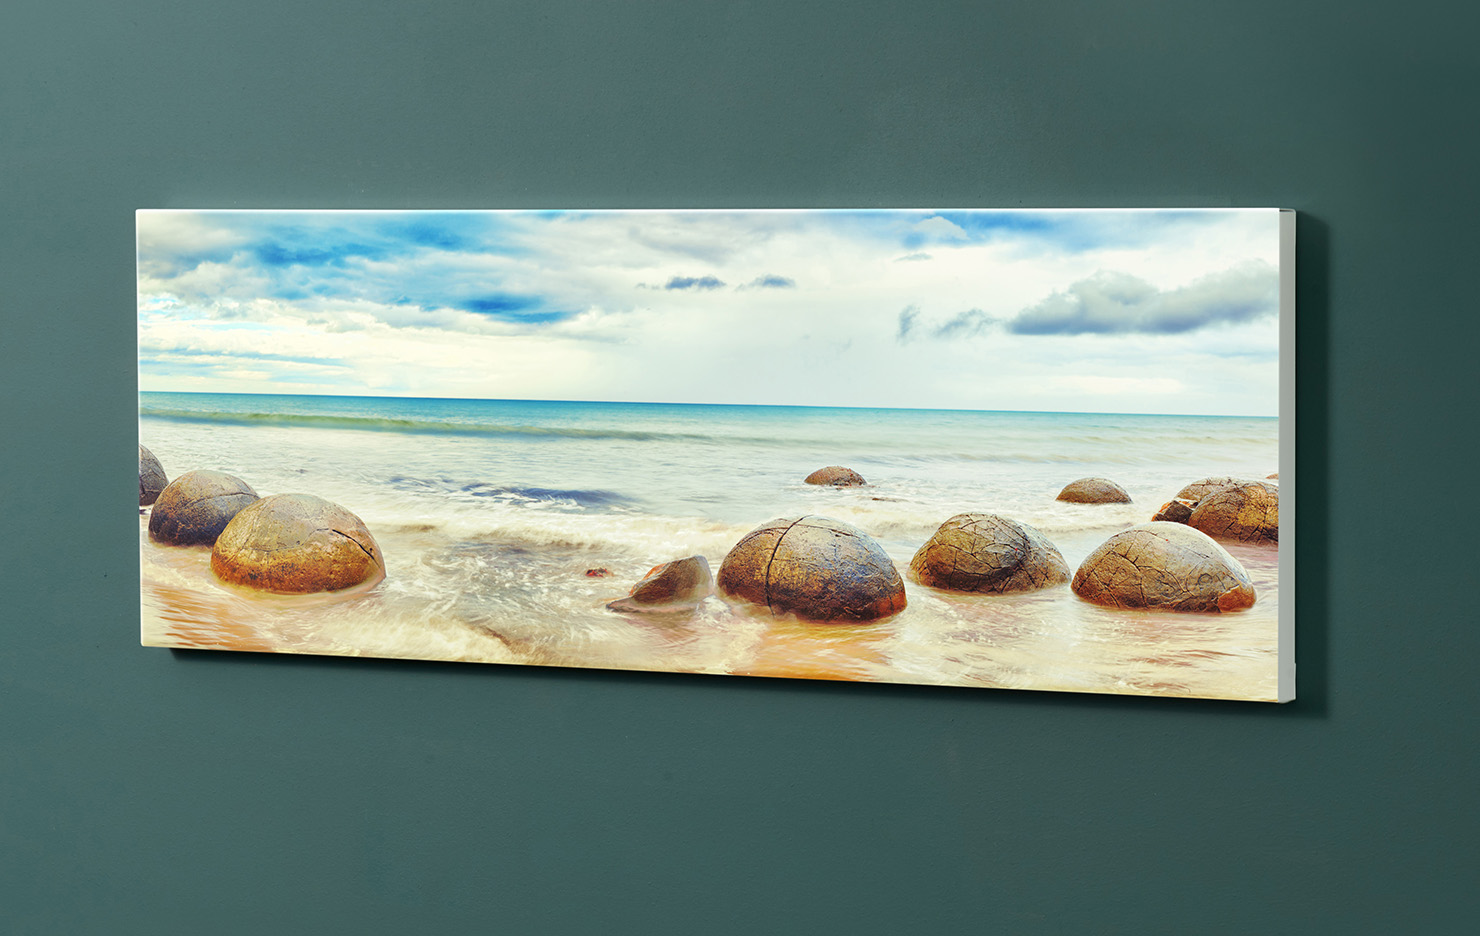 Magnettafel NOTIZ 90x30cm Motiv-Pinnwand M113 Strand Steine